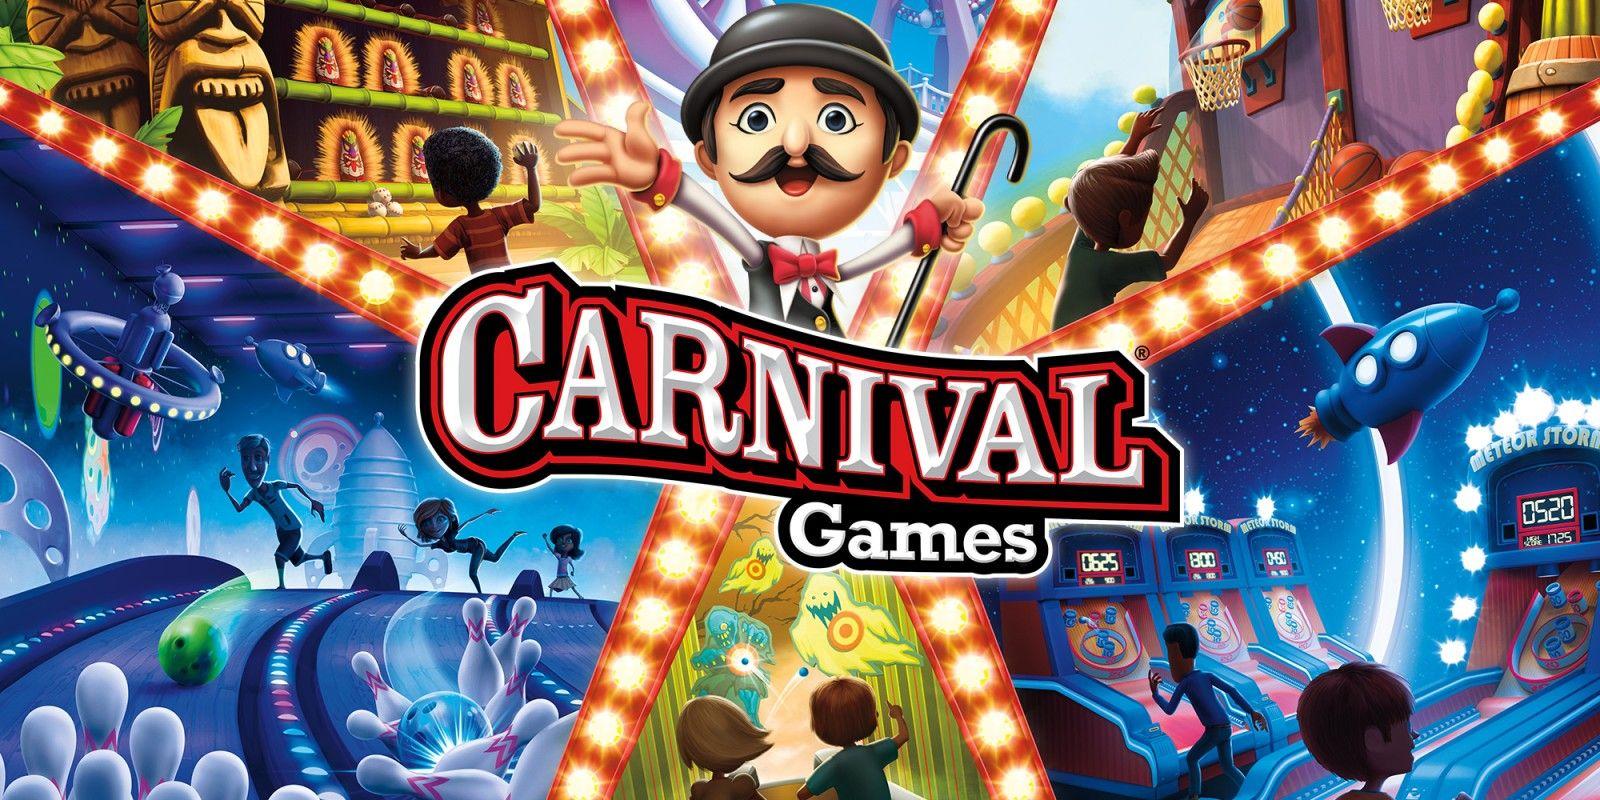 Carnival Games for Nintendo Switch (digital) £12.24 @ Nintendo eShop